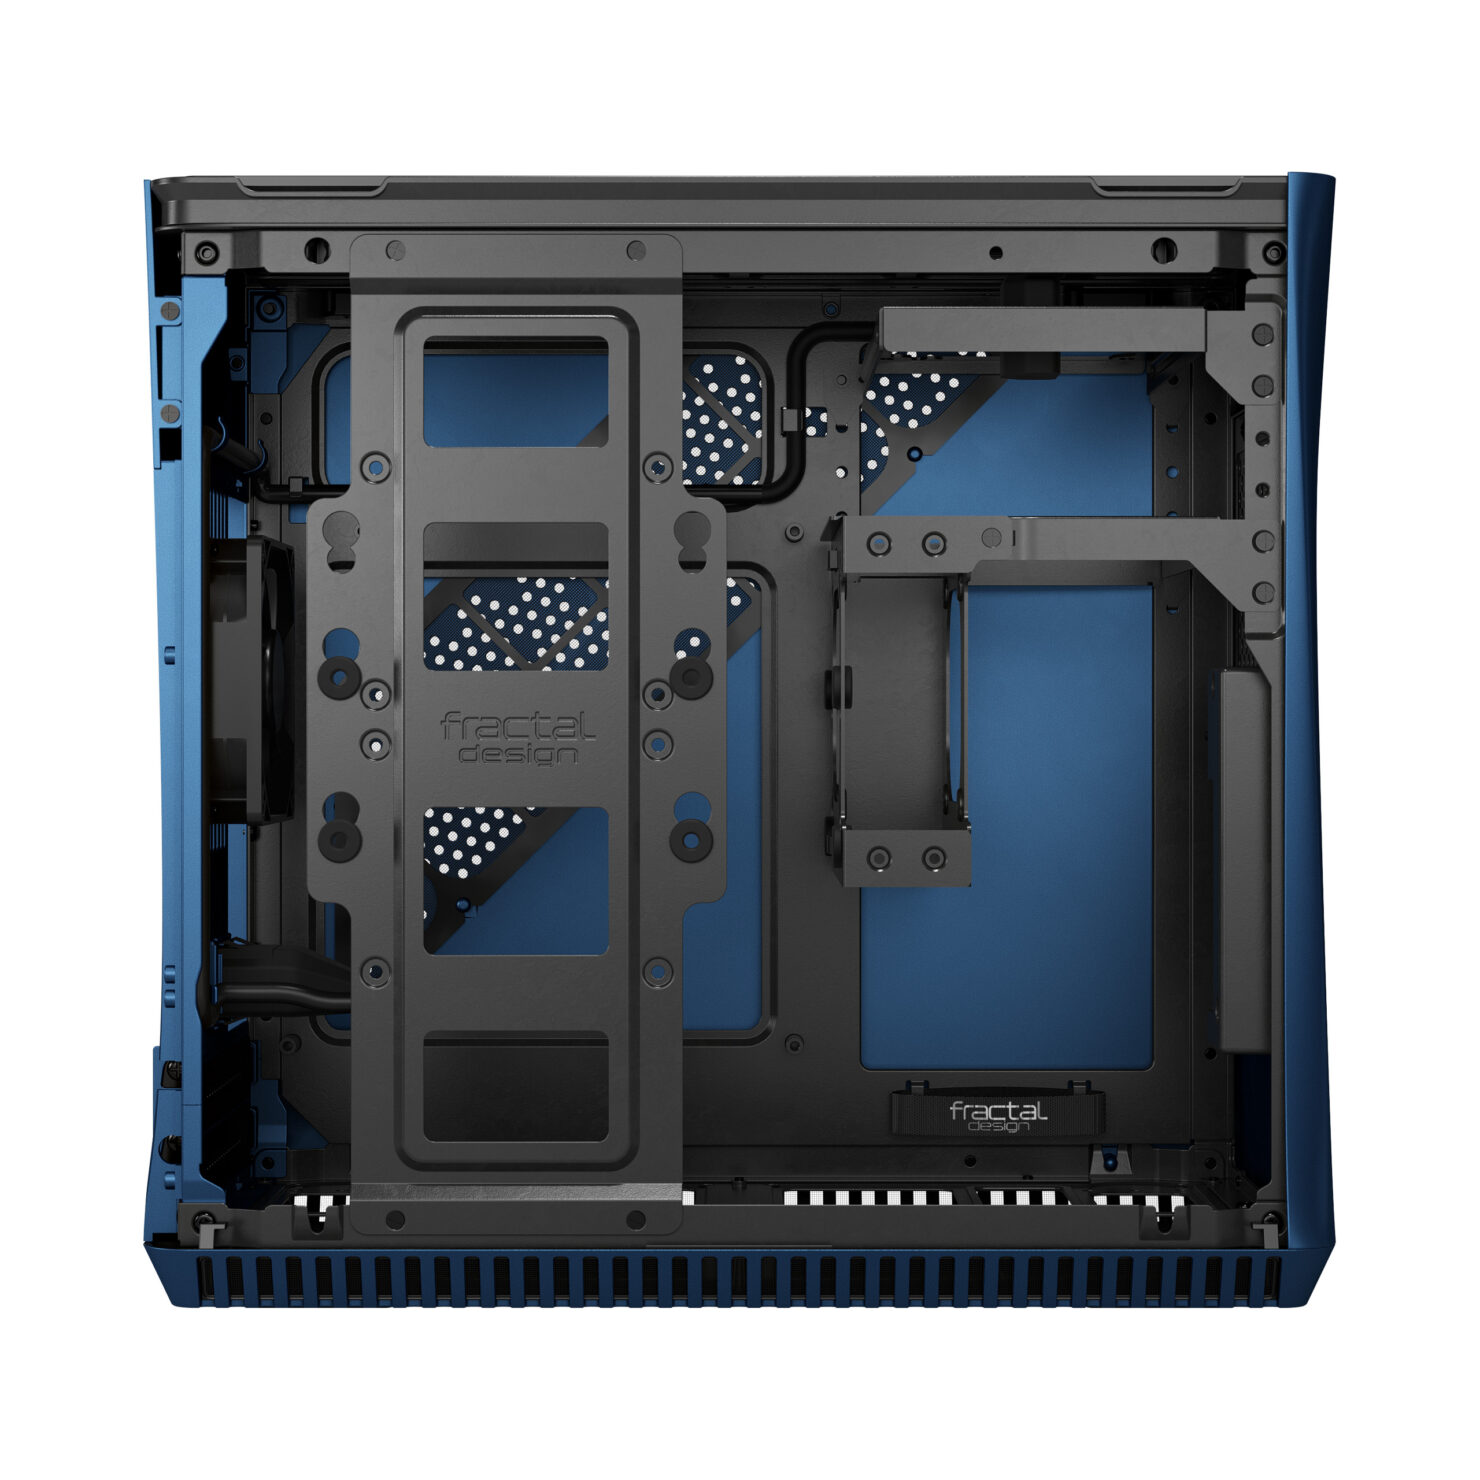 eraitx_side_right_product_blue